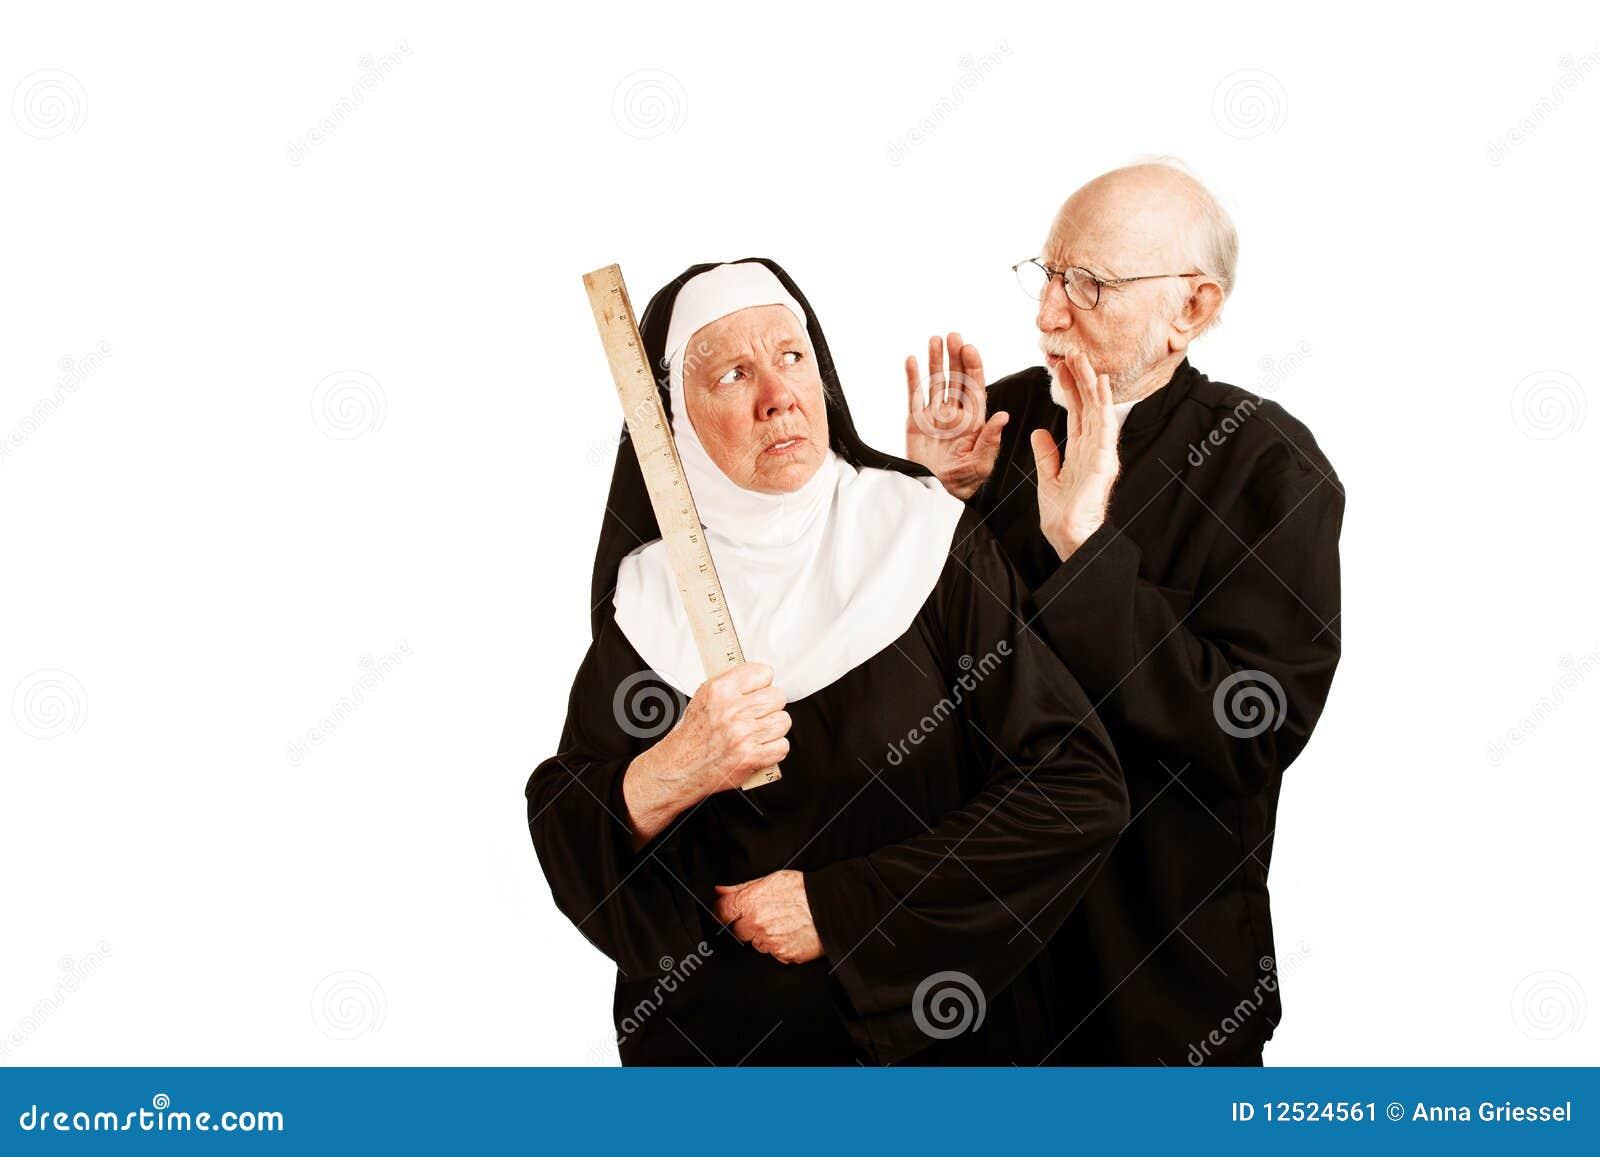 Priest and nun sex hentay scenes